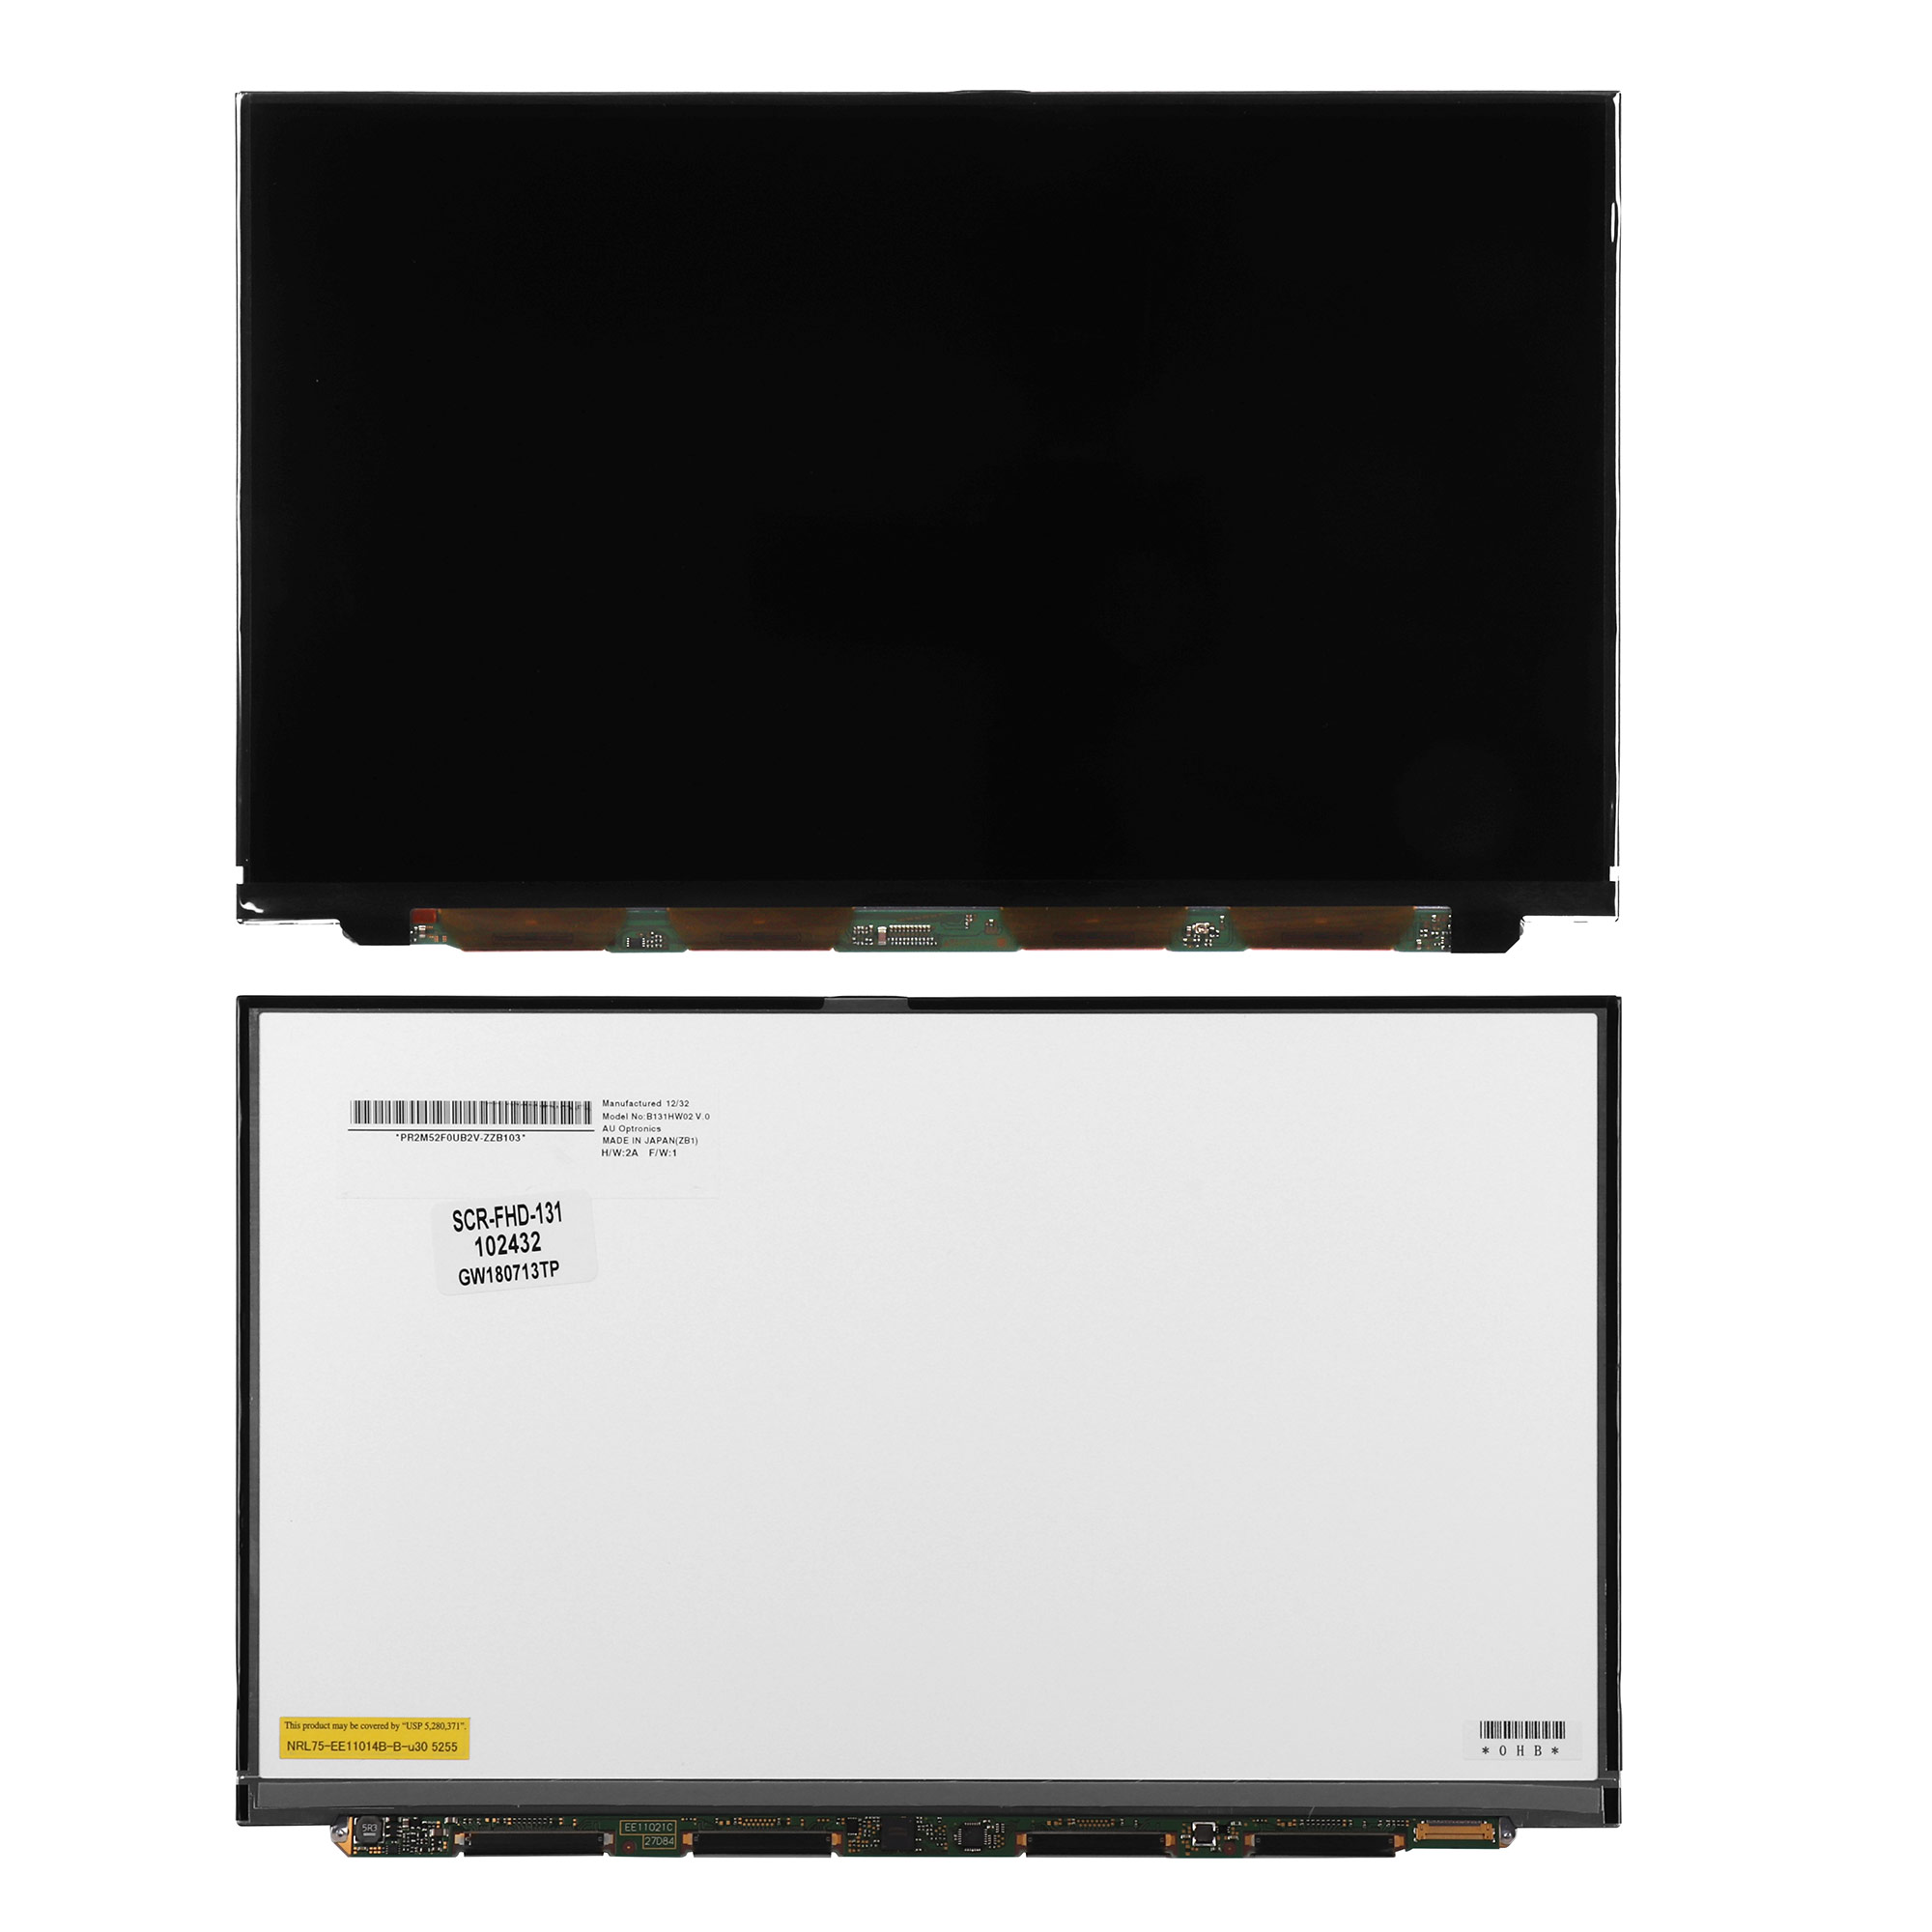 Запчасти для ремонта теле, видео, аудио 13.1 1920x1080 WUXGA FHD 30 pin Slim LED. Матовая. PN: B131HW02 V.0.